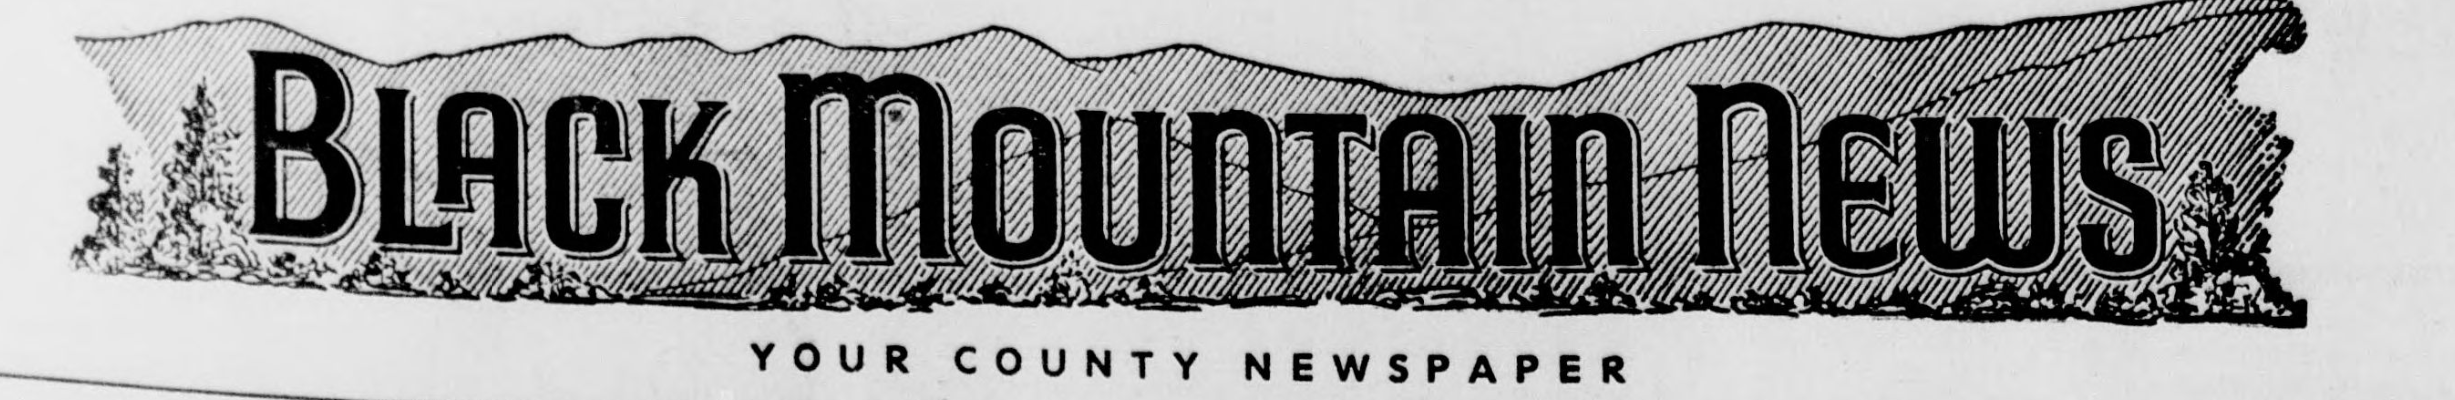 Black Mountain News title